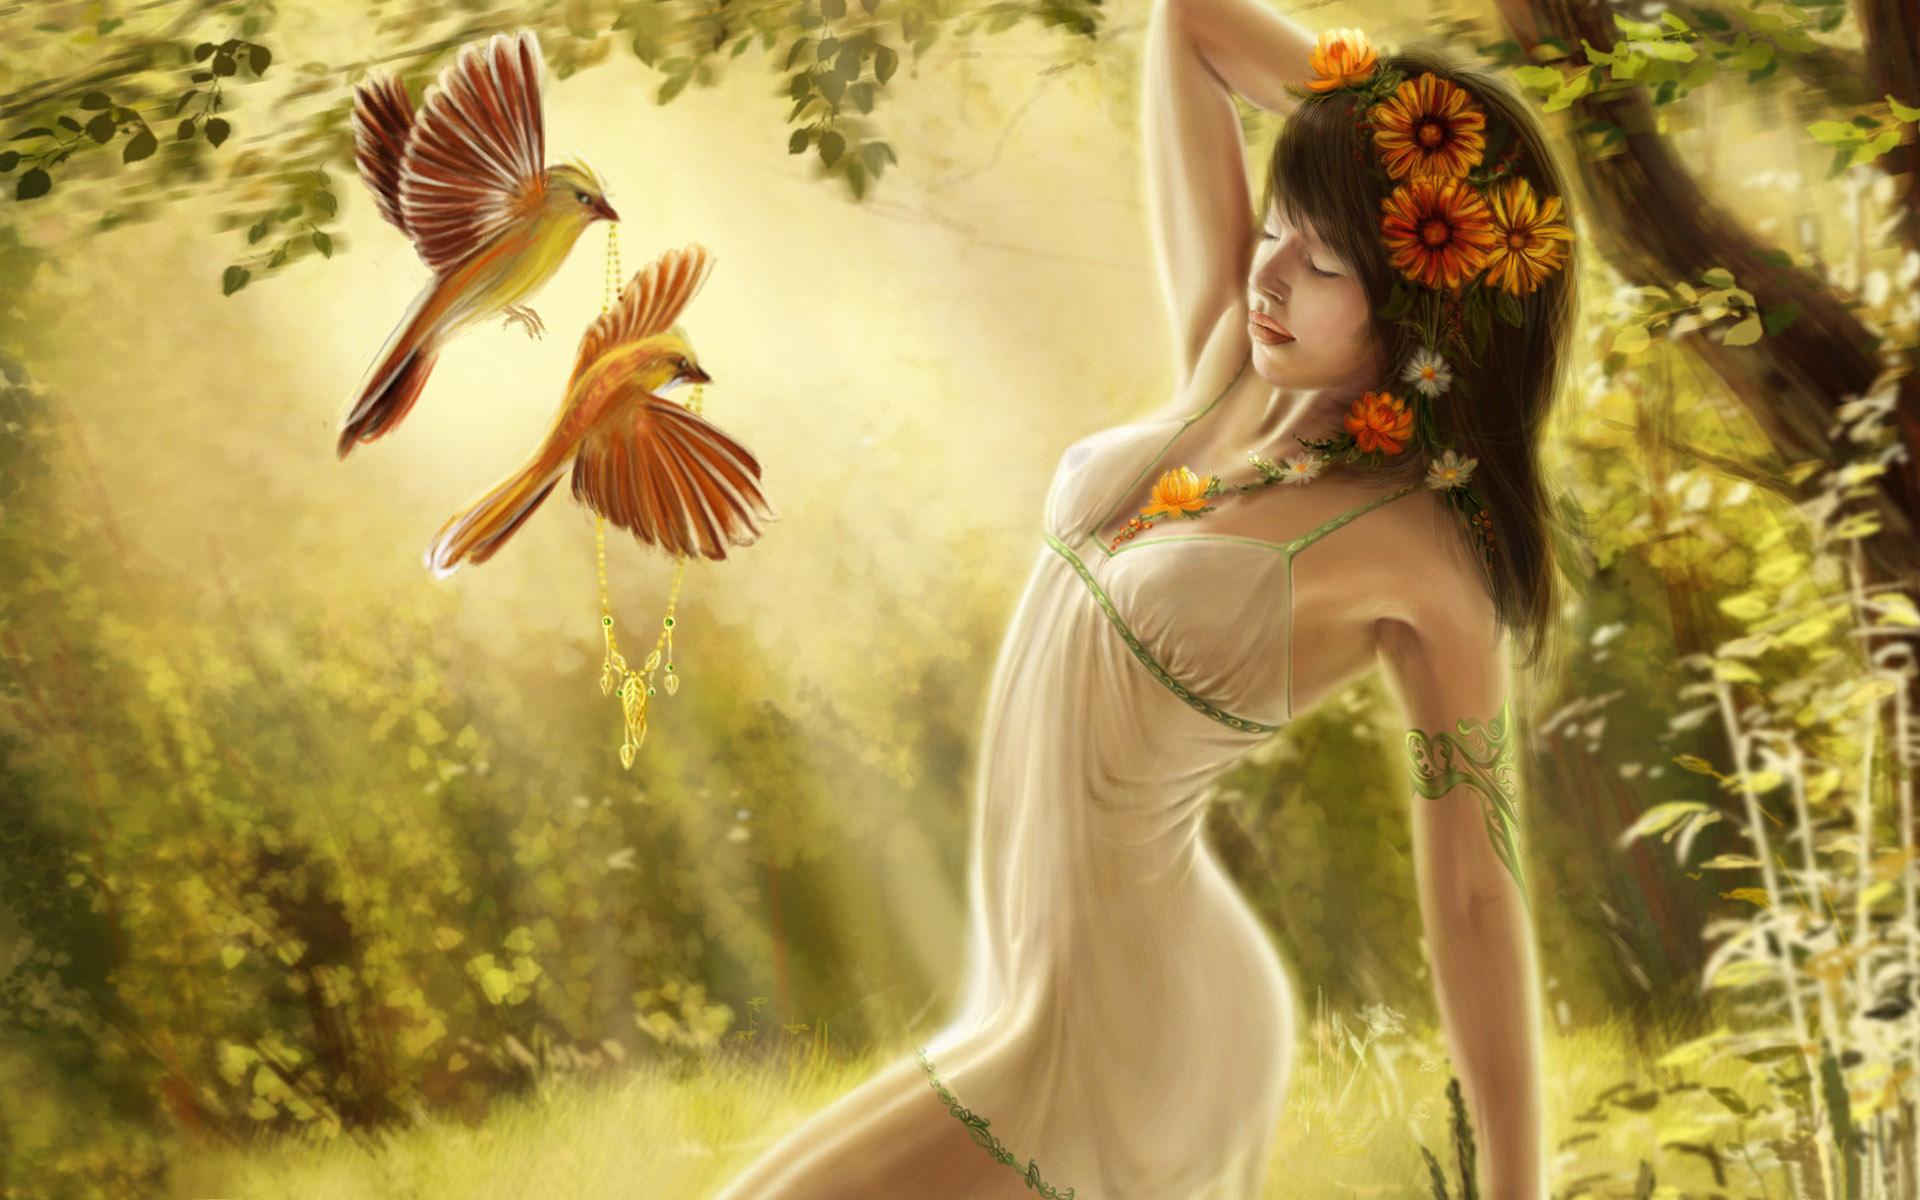 Digital Fantasy Girl Art Wallpapers HD Wallpapers 1920x1200